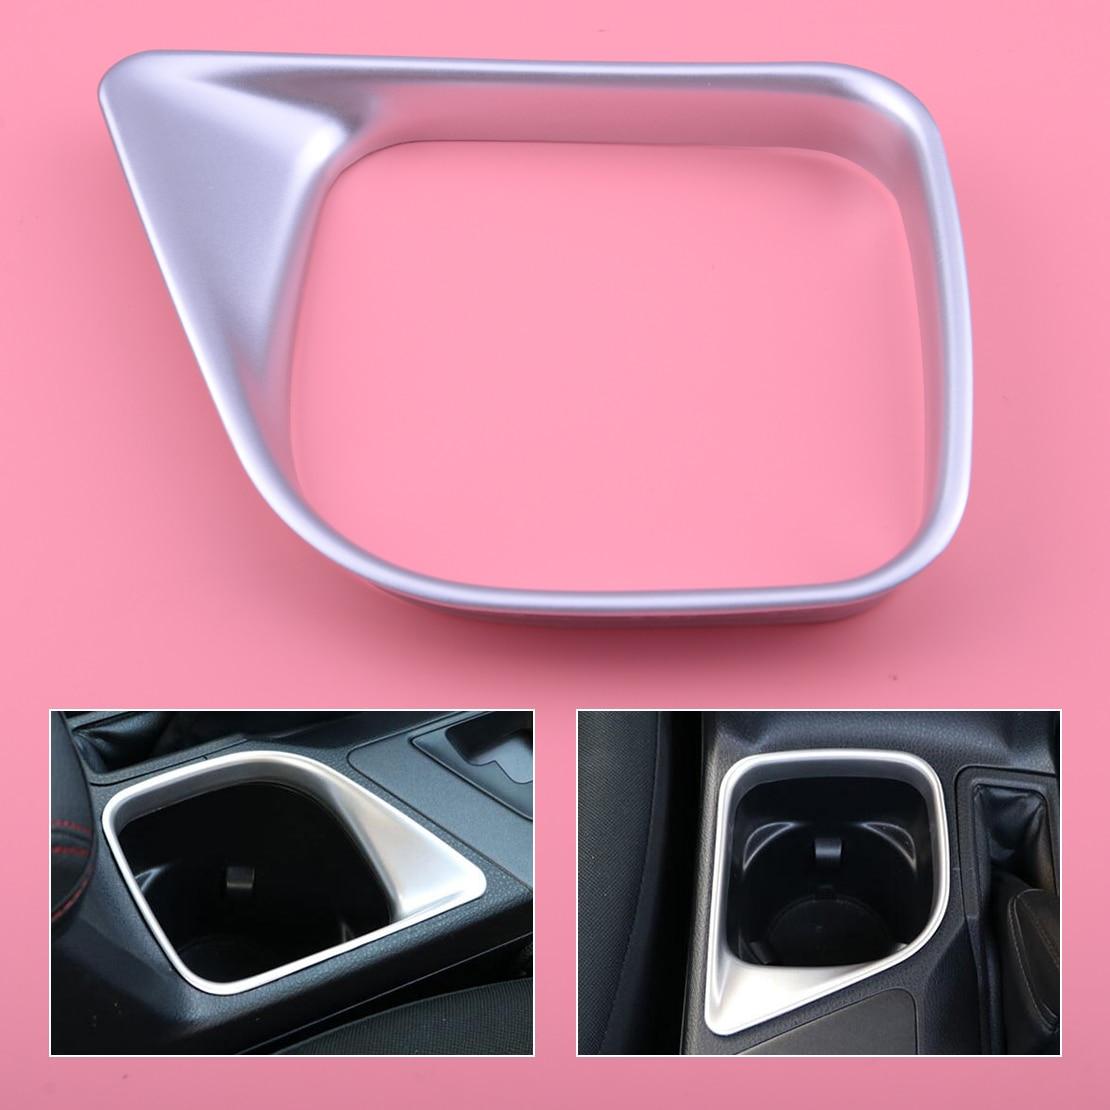 DWCX ABS cromado, soporte para taza Interior de coche, cubierta de Panel de posición embellecedora para Toyota RAV4 2016 2017 2018